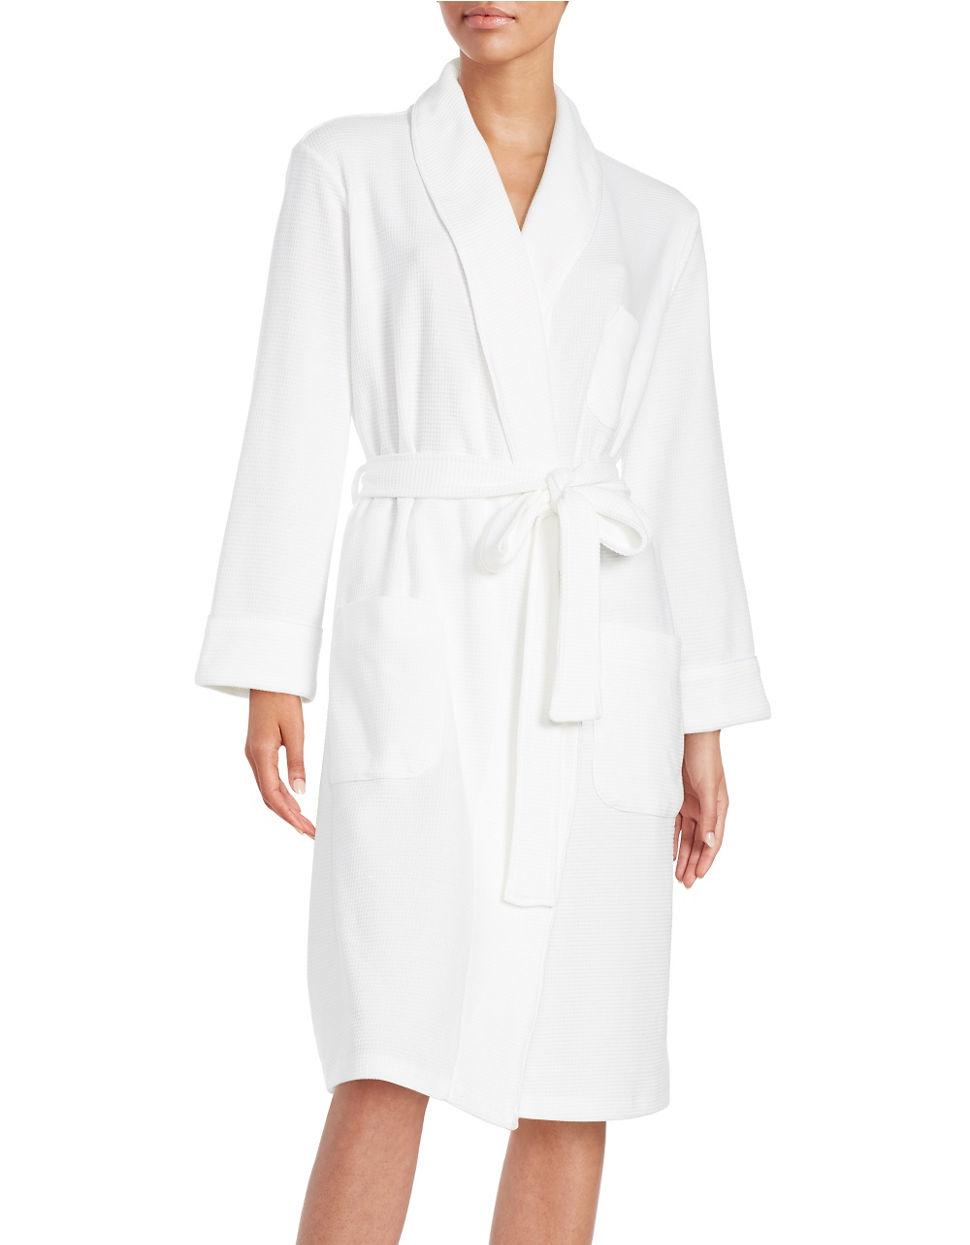 5b0aafda0fd8f Lyst - Lord & Taylor Waffle Knit Robe in White